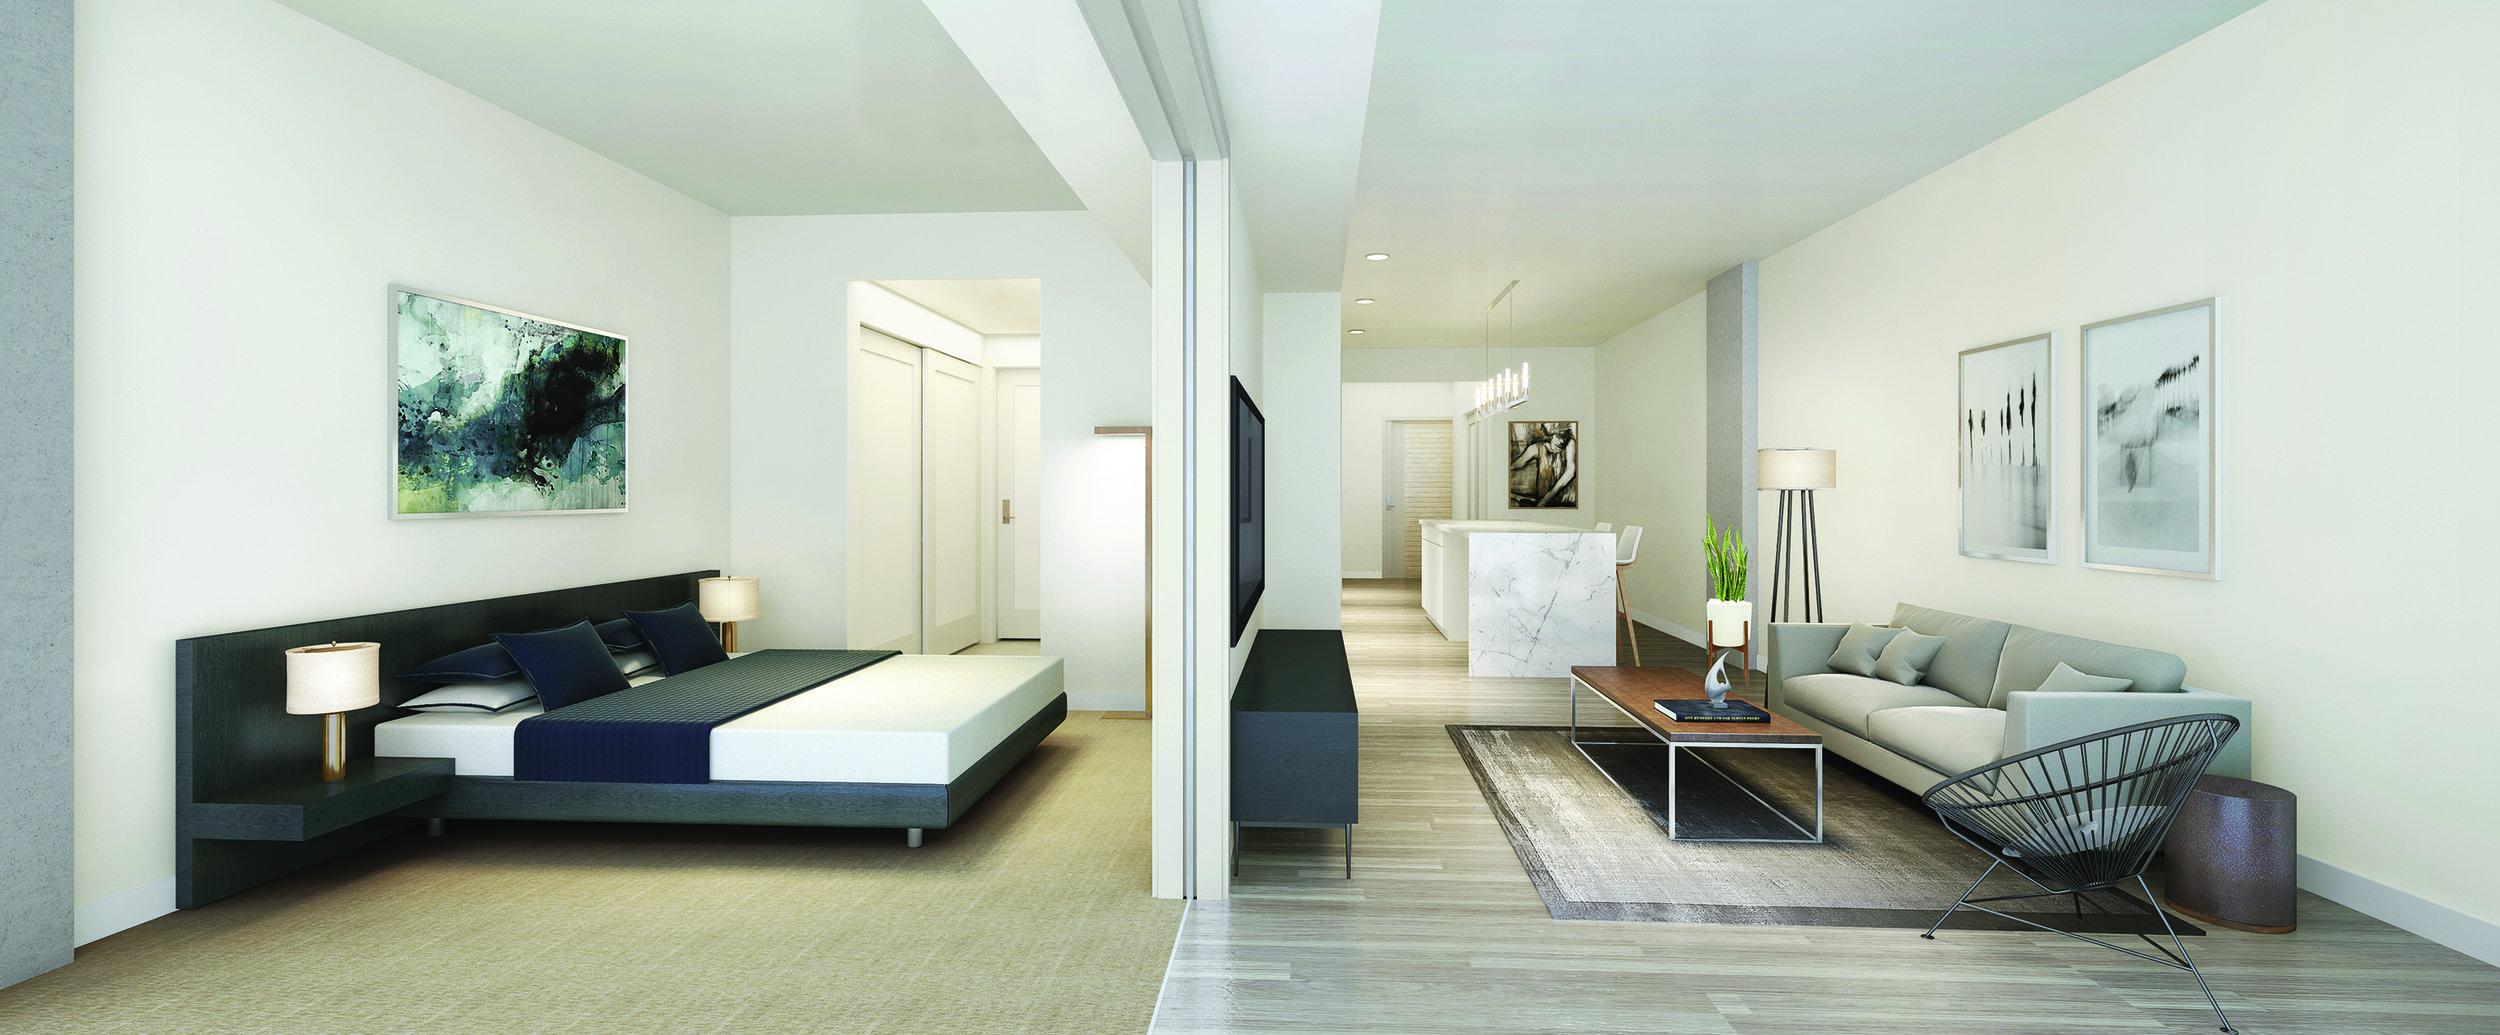 koda seattle condos bedroom layout